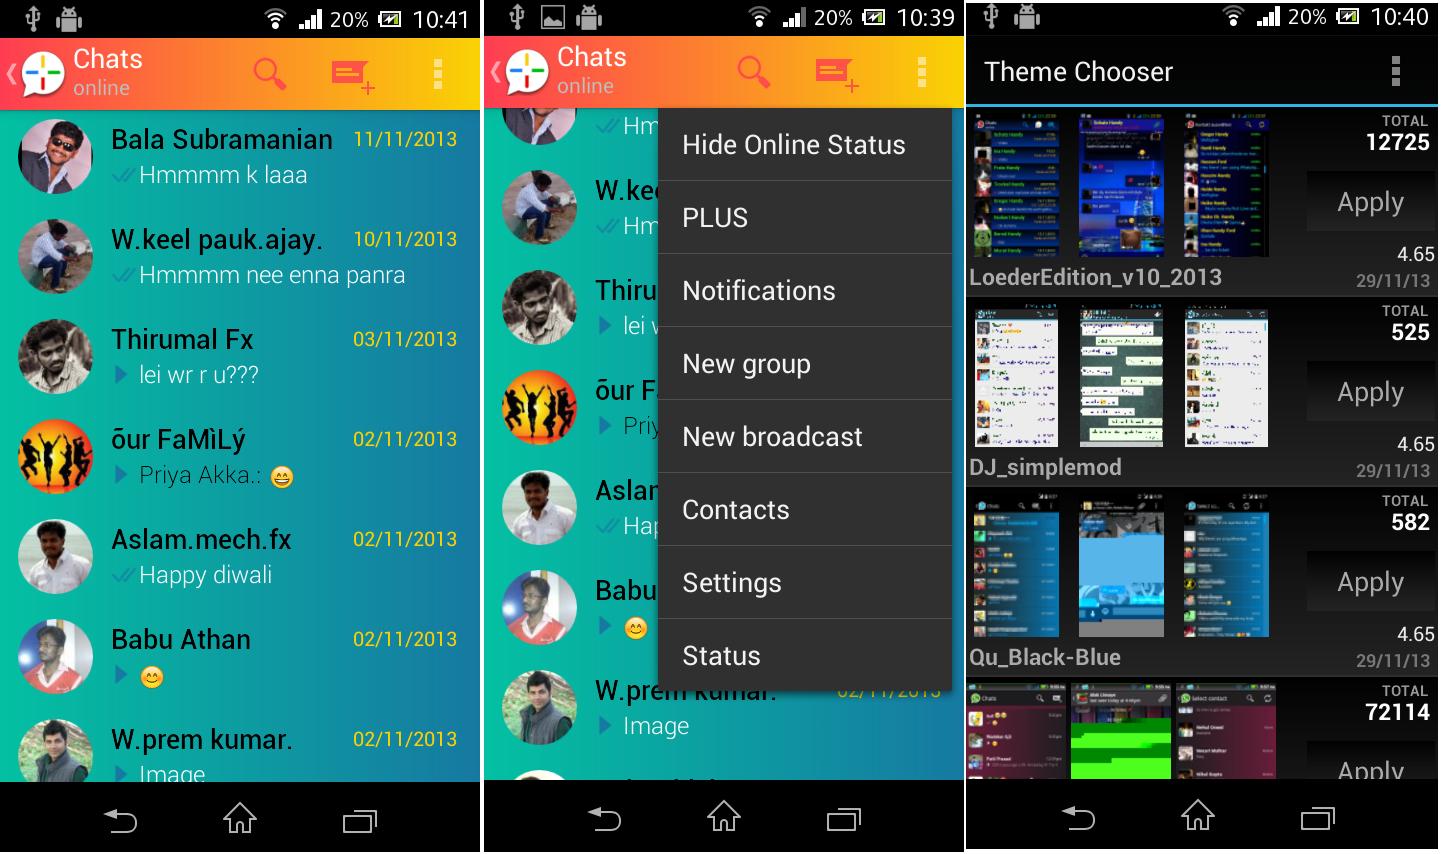 Whatsapp Plus Apk Mod Theme Terbaru Soal Sekolah